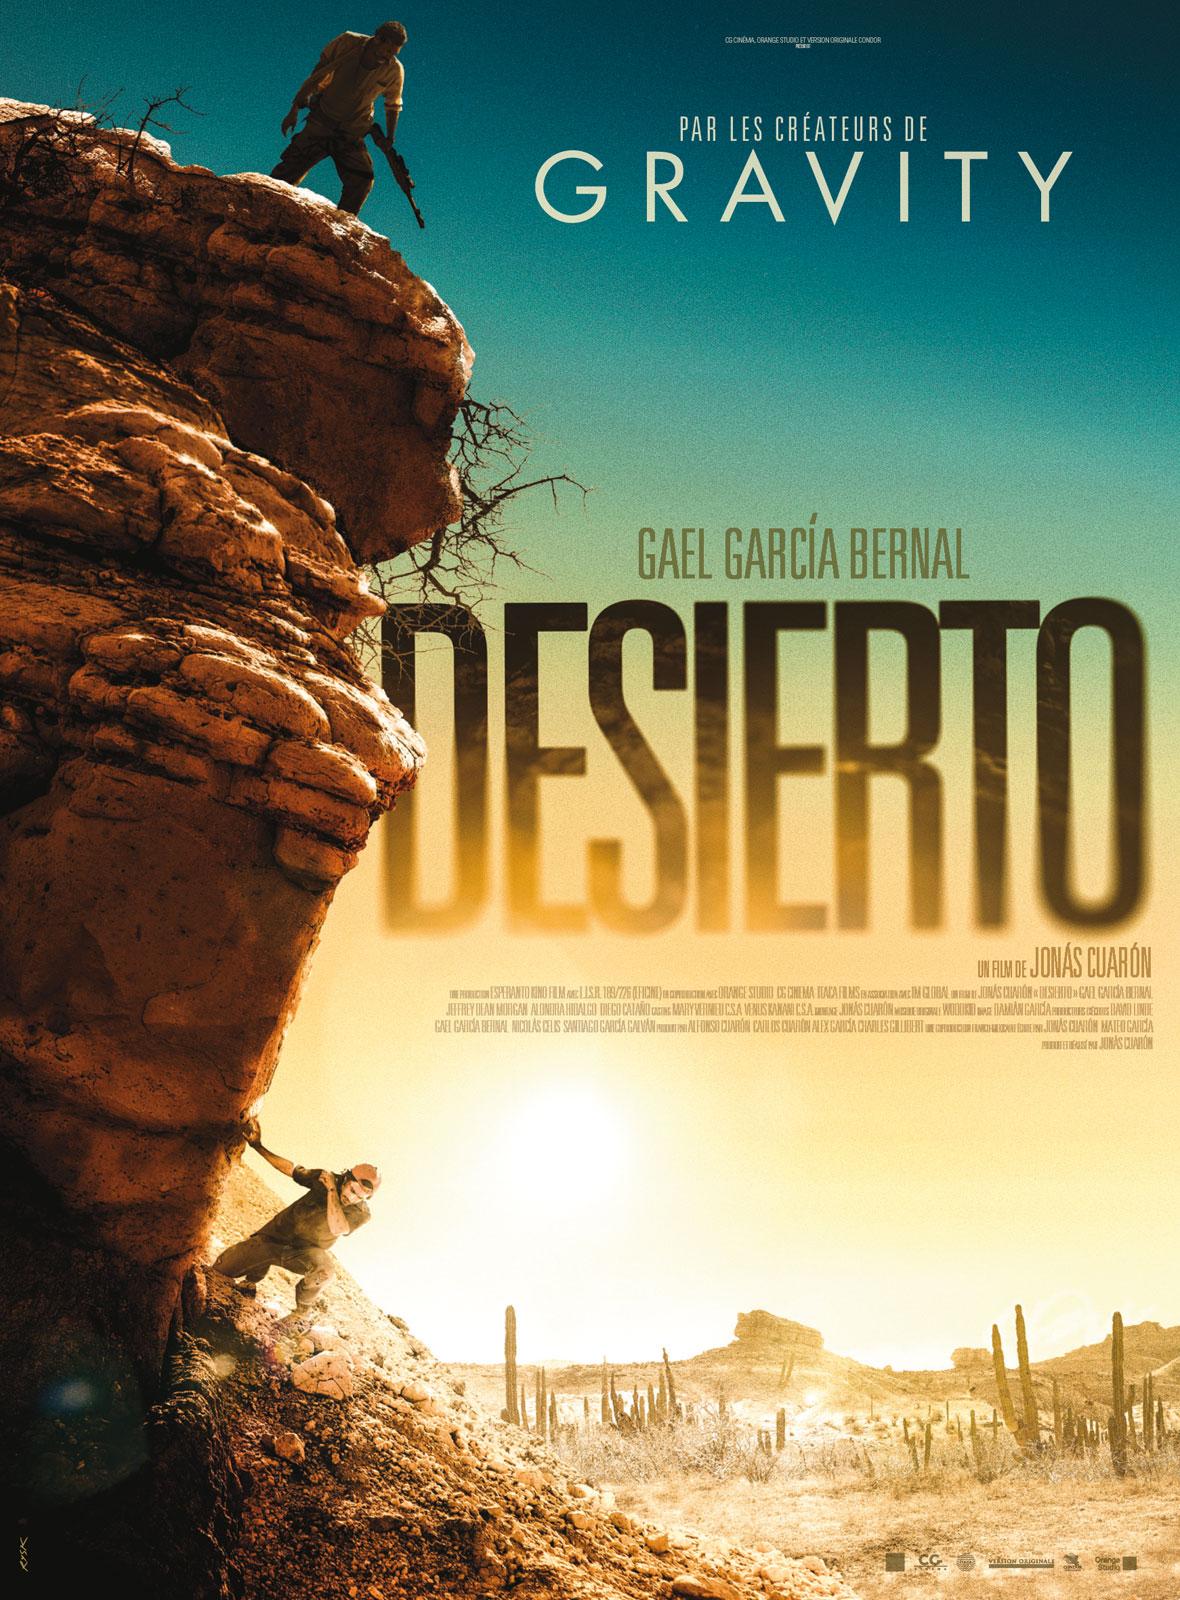 Desierto ddl